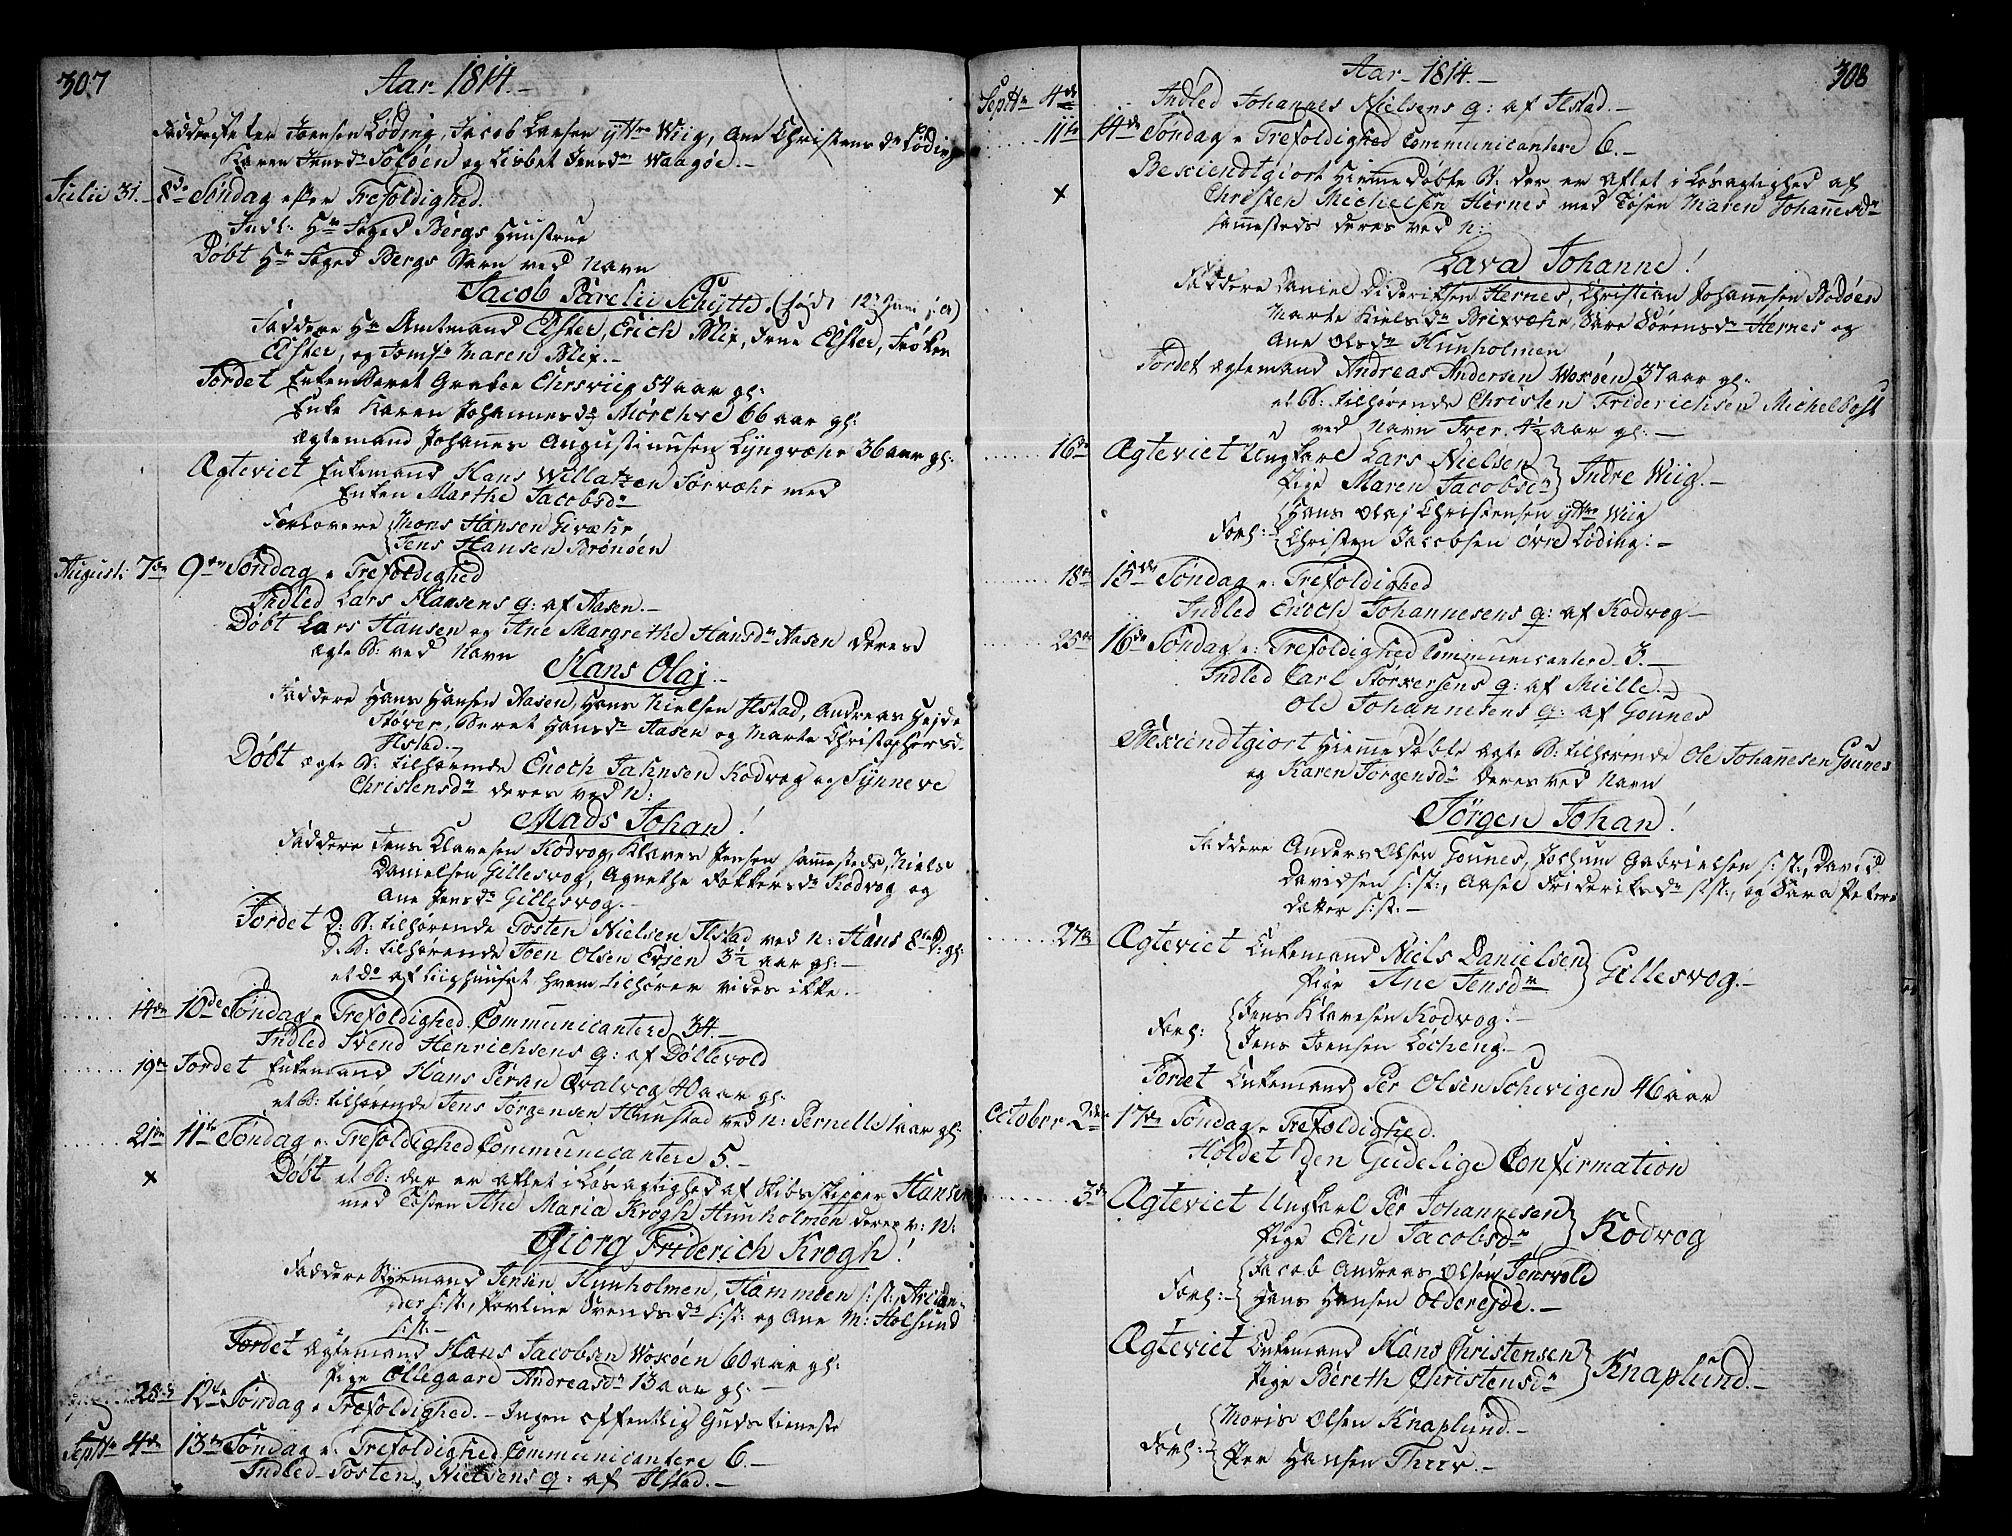 SAT, Ministerialprotokoller, klokkerbøker og fødselsregistre - Nordland, 801/L0004: Ministerialbok nr. 801A04, 1796-1817, s. 307-308